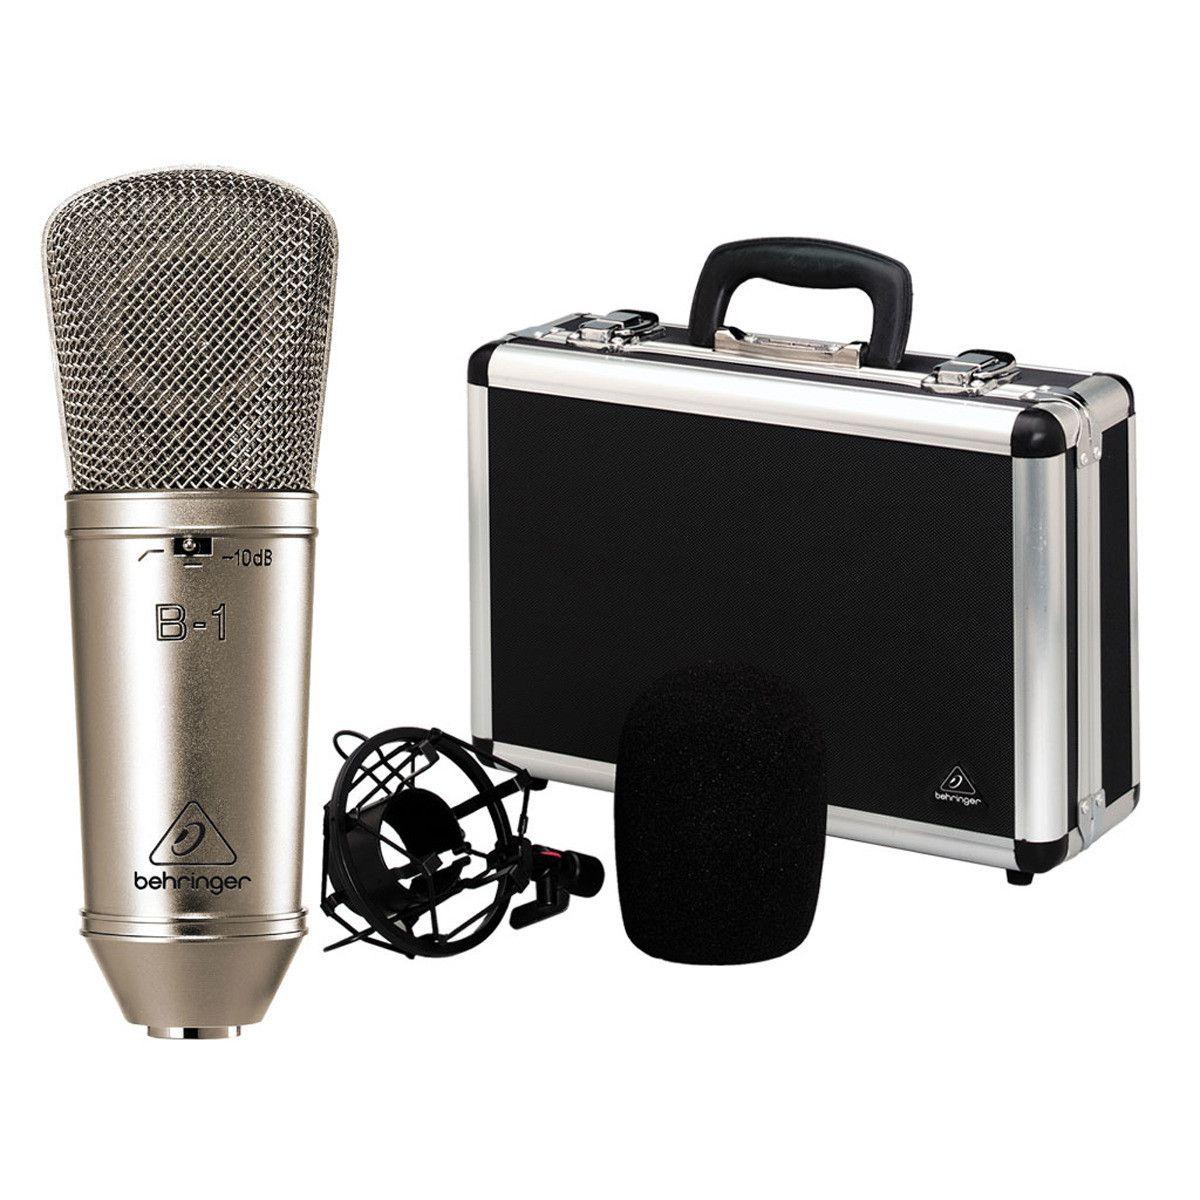 Microfone Behringer B-1 Condensador Semi-Novo